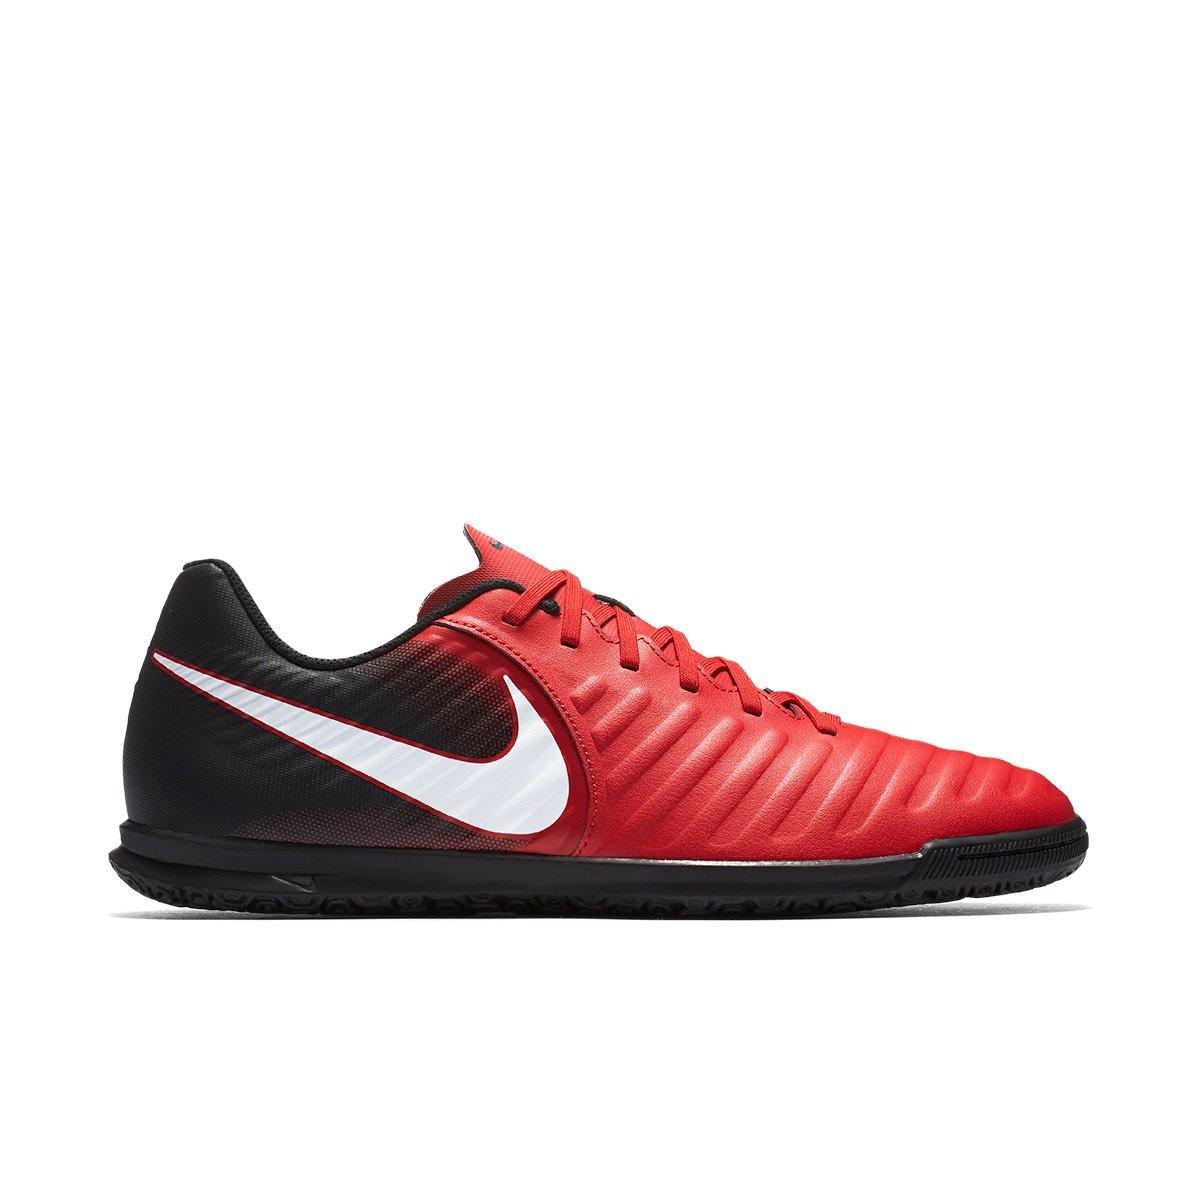 b64968a897 Chuteira Futsal Nike Tiempo Rio 4 IC